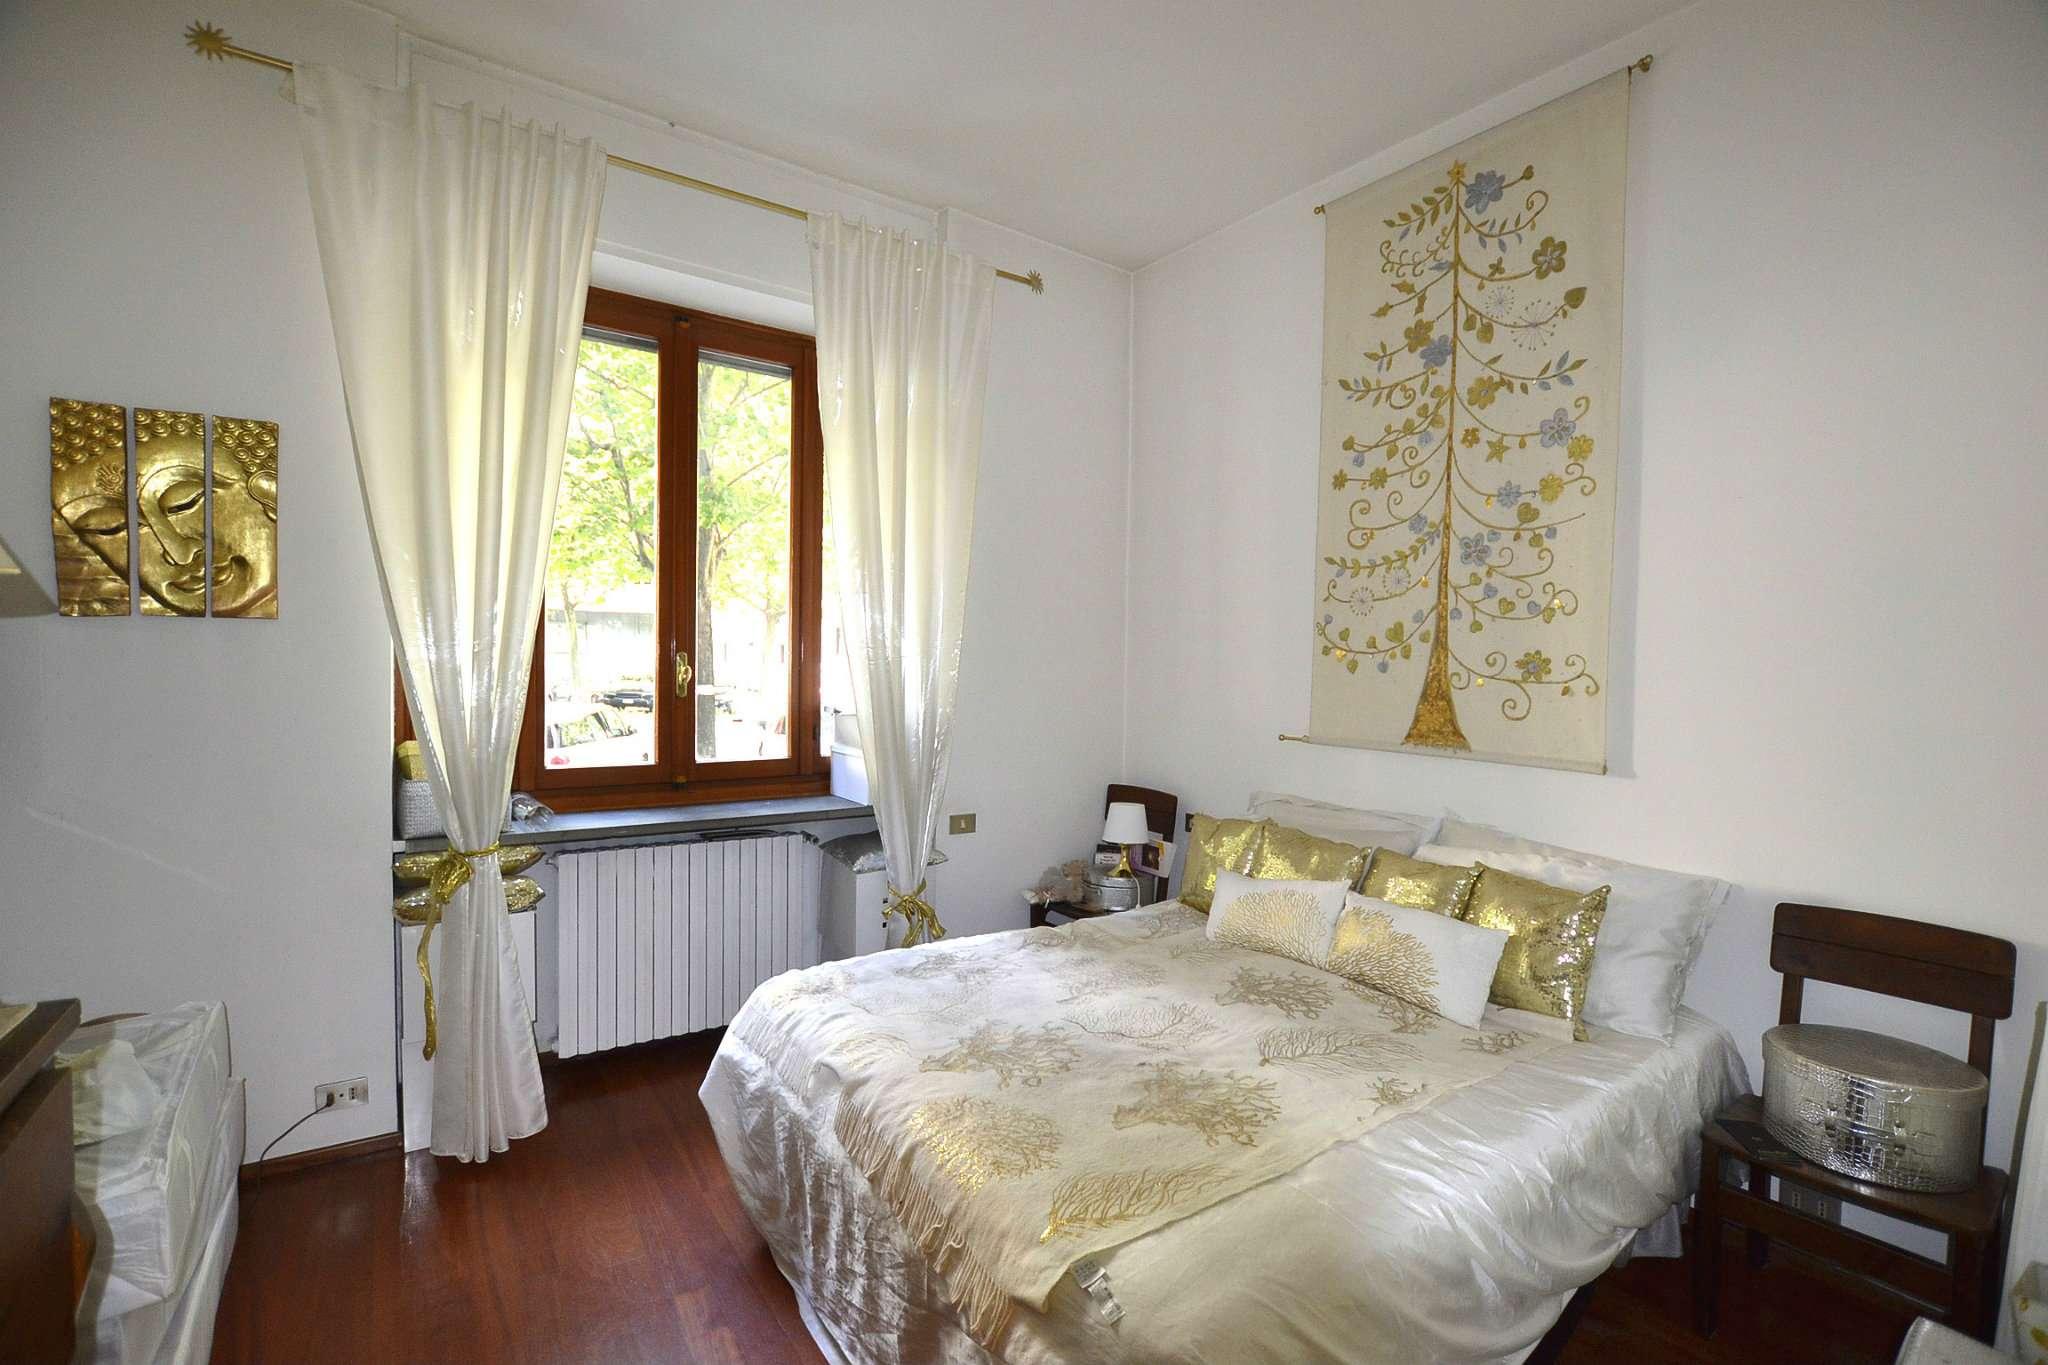 Torino Torino Affitto APPARTAMENTO , appartamentio torino